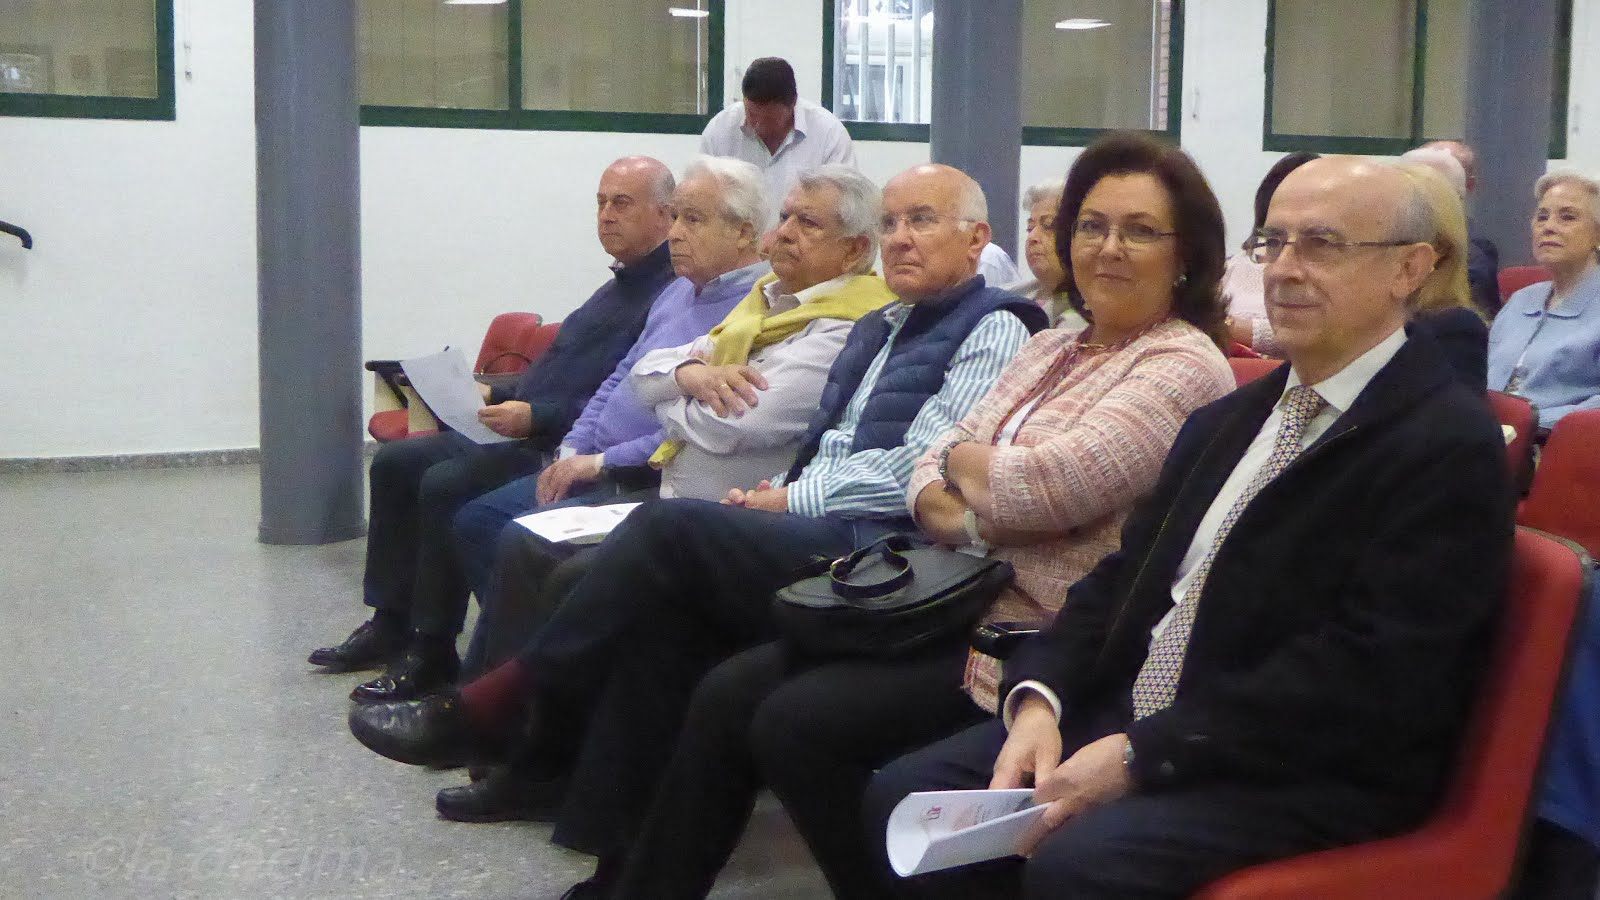 PRESENTACION LIBRO SAN ISIDORO DE SEVILLA EN SEVILLA